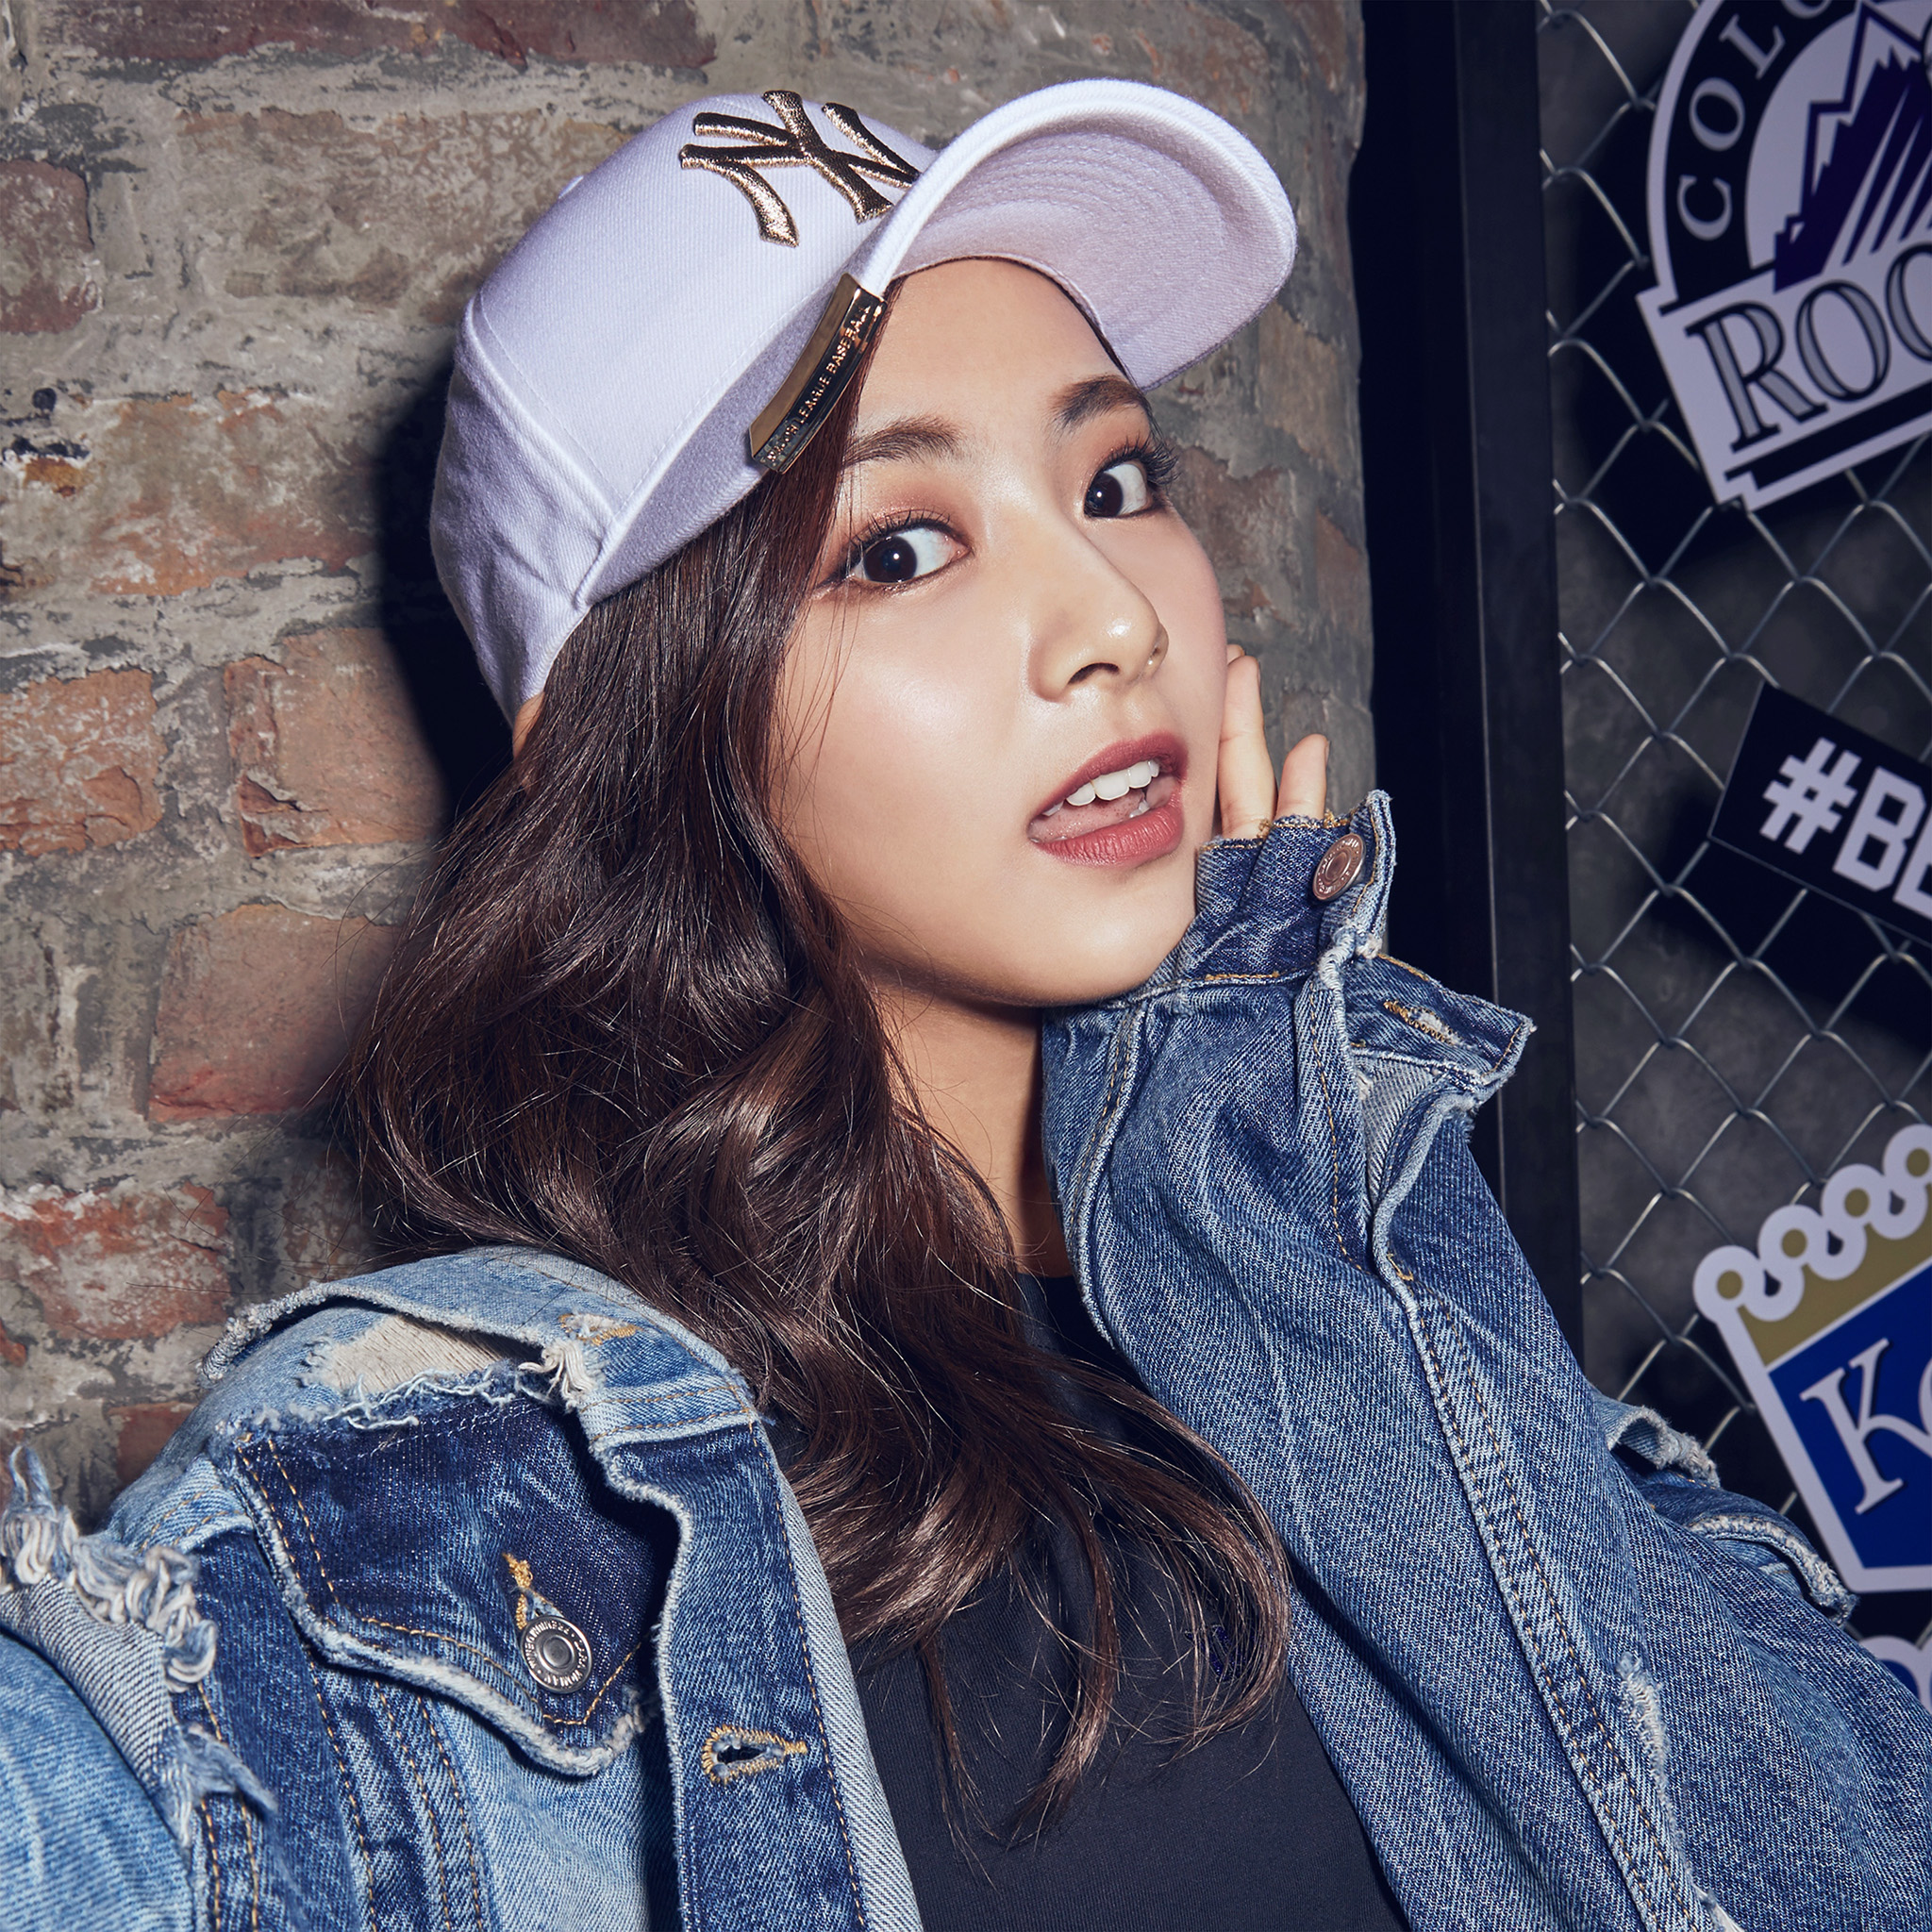 ho79-twice-girl-tzuyu-cute-wallpaper